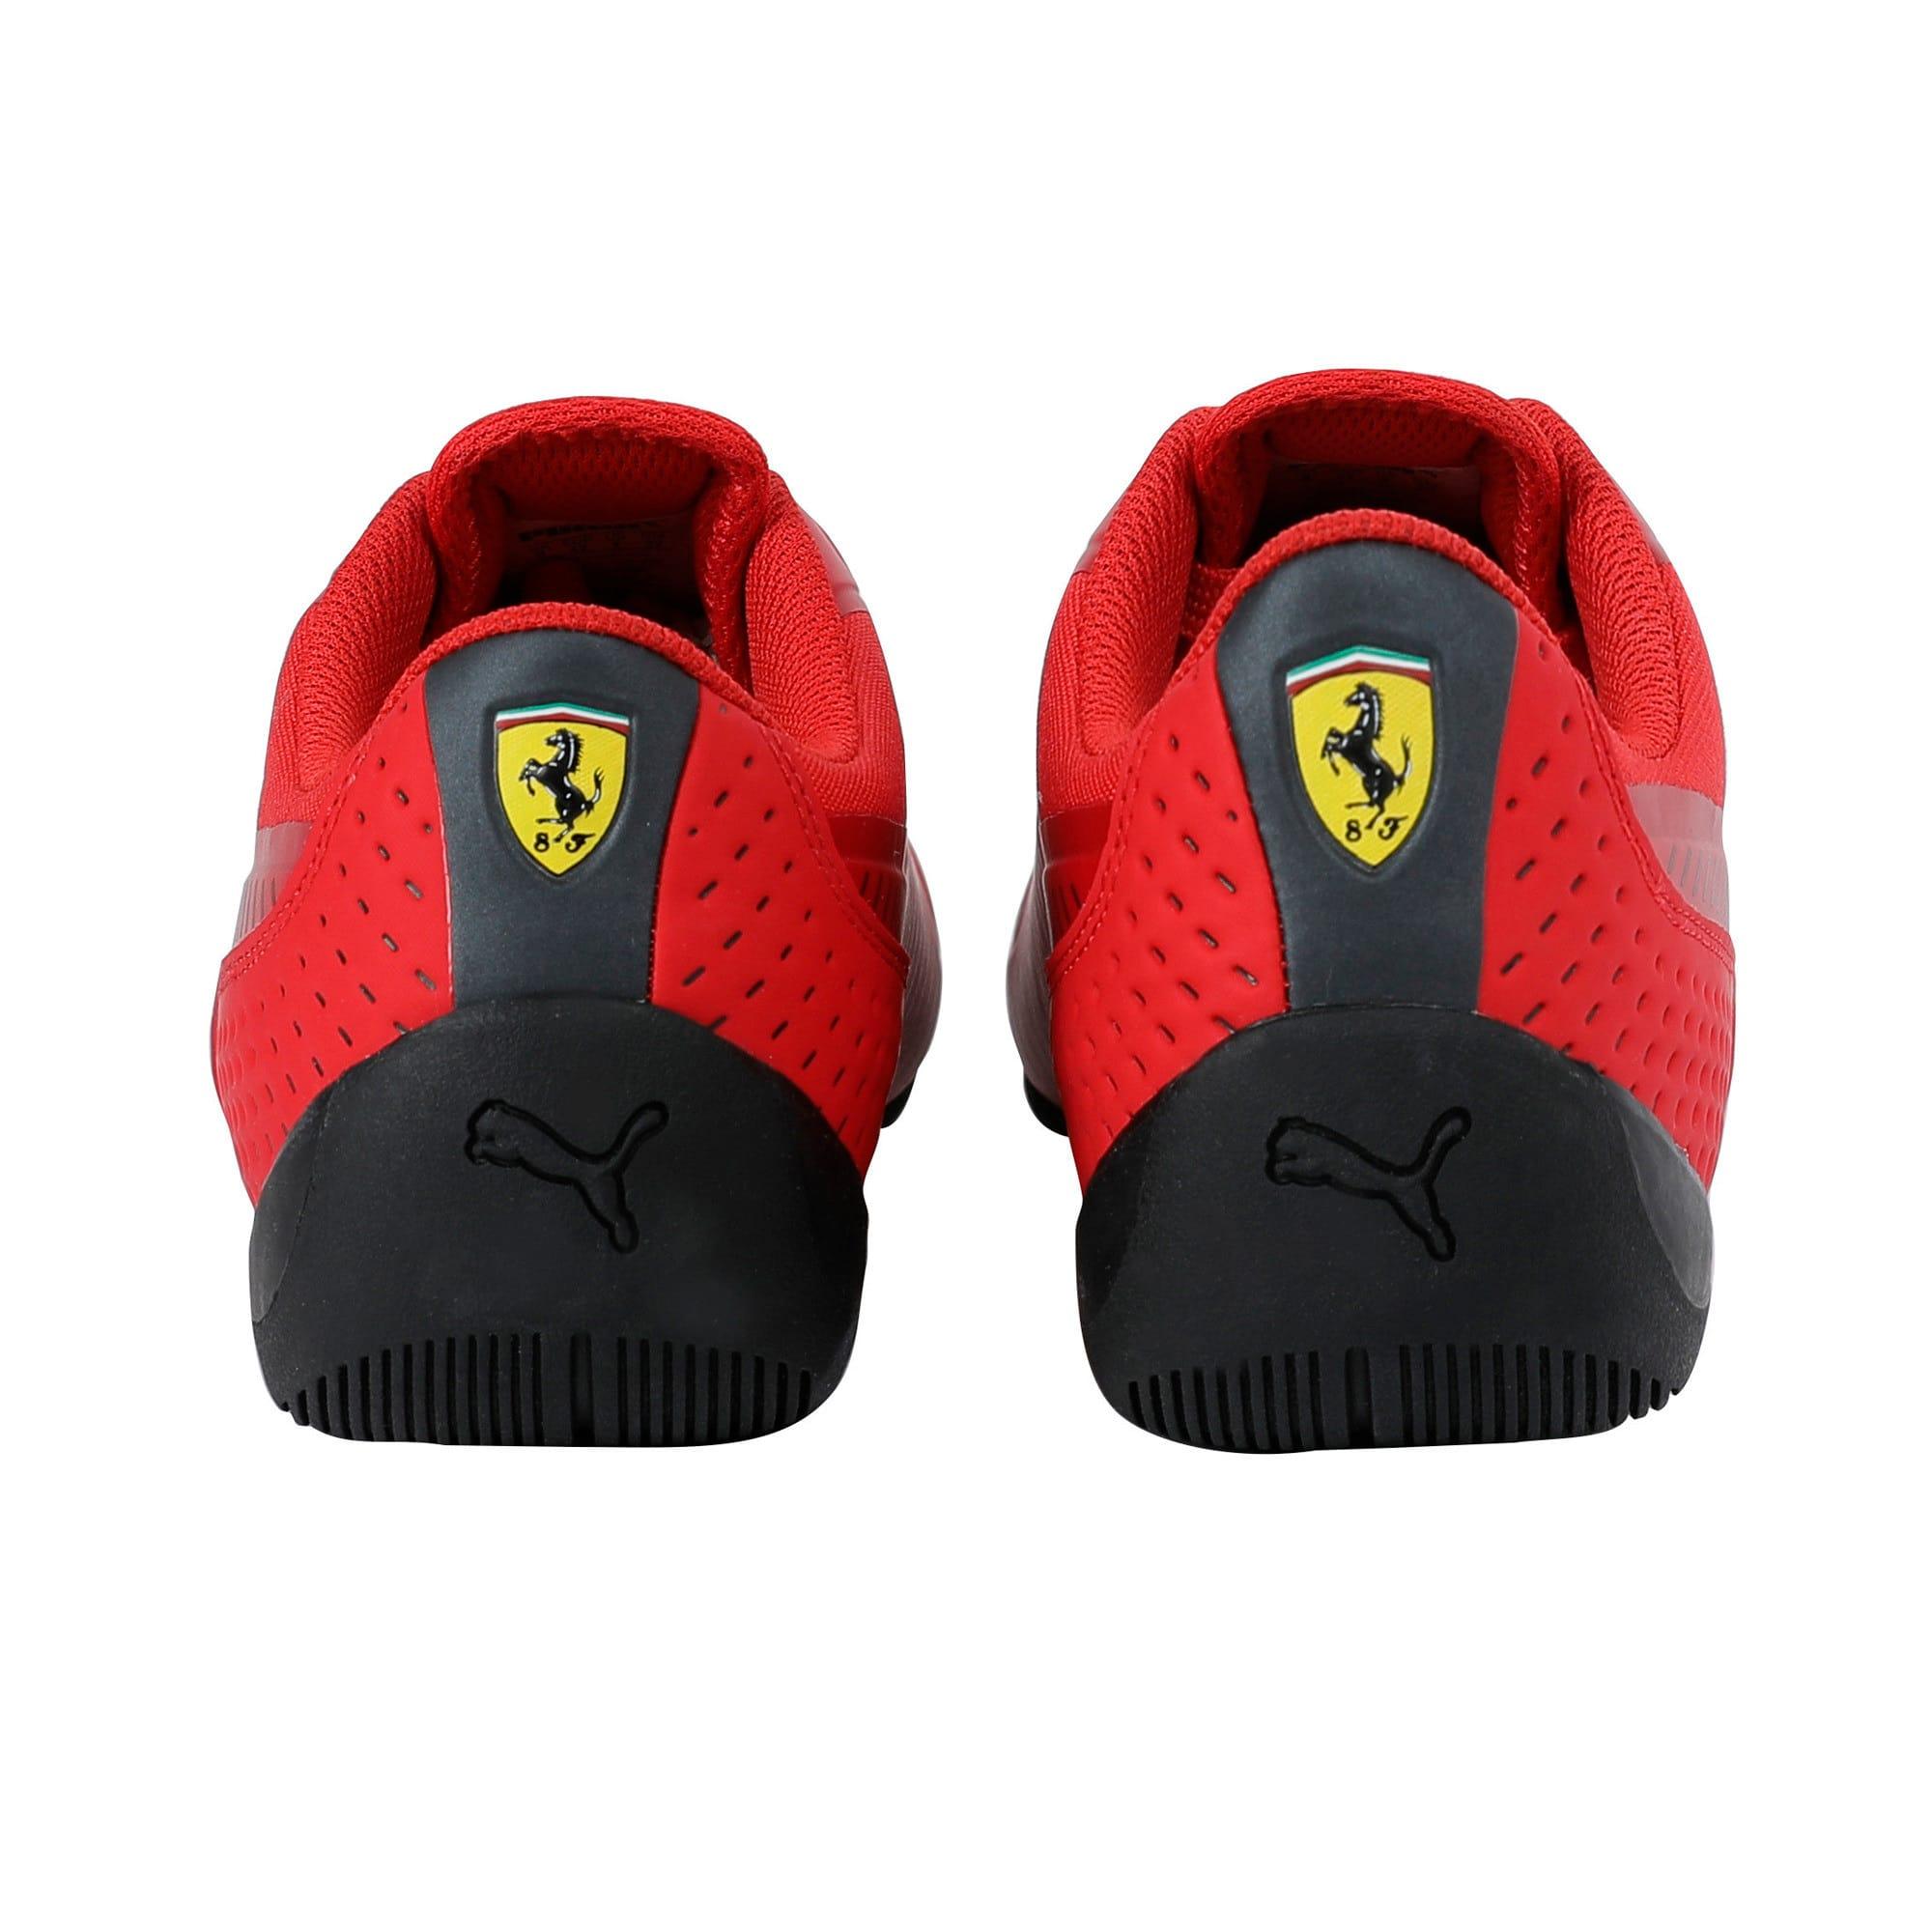 Thumbnail 3 of Ferrari Drift Cat 7 Ultra Trainers, Rosso Corsa-Puma Black, medium-IND